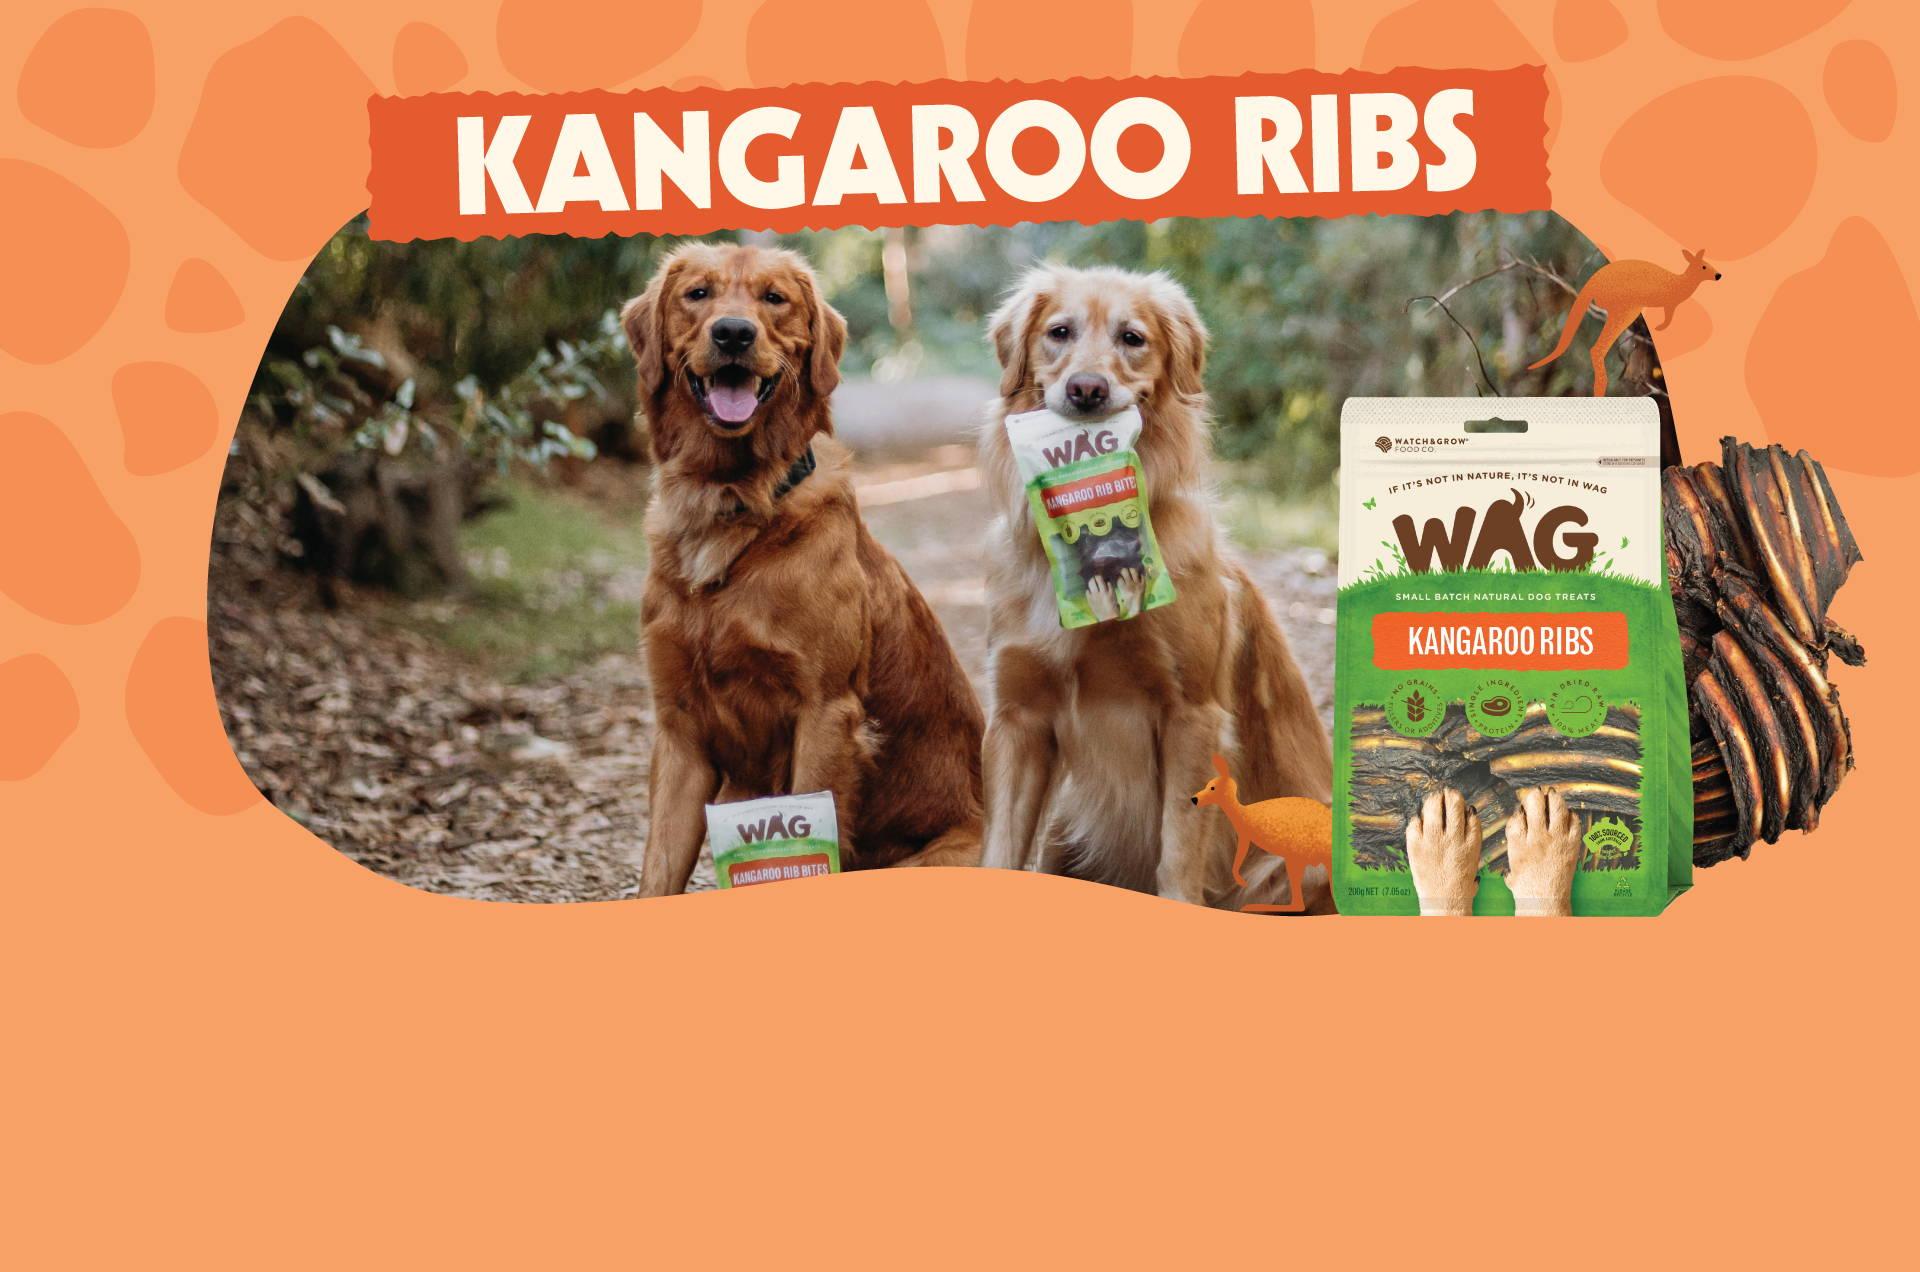 kangaroo ribs